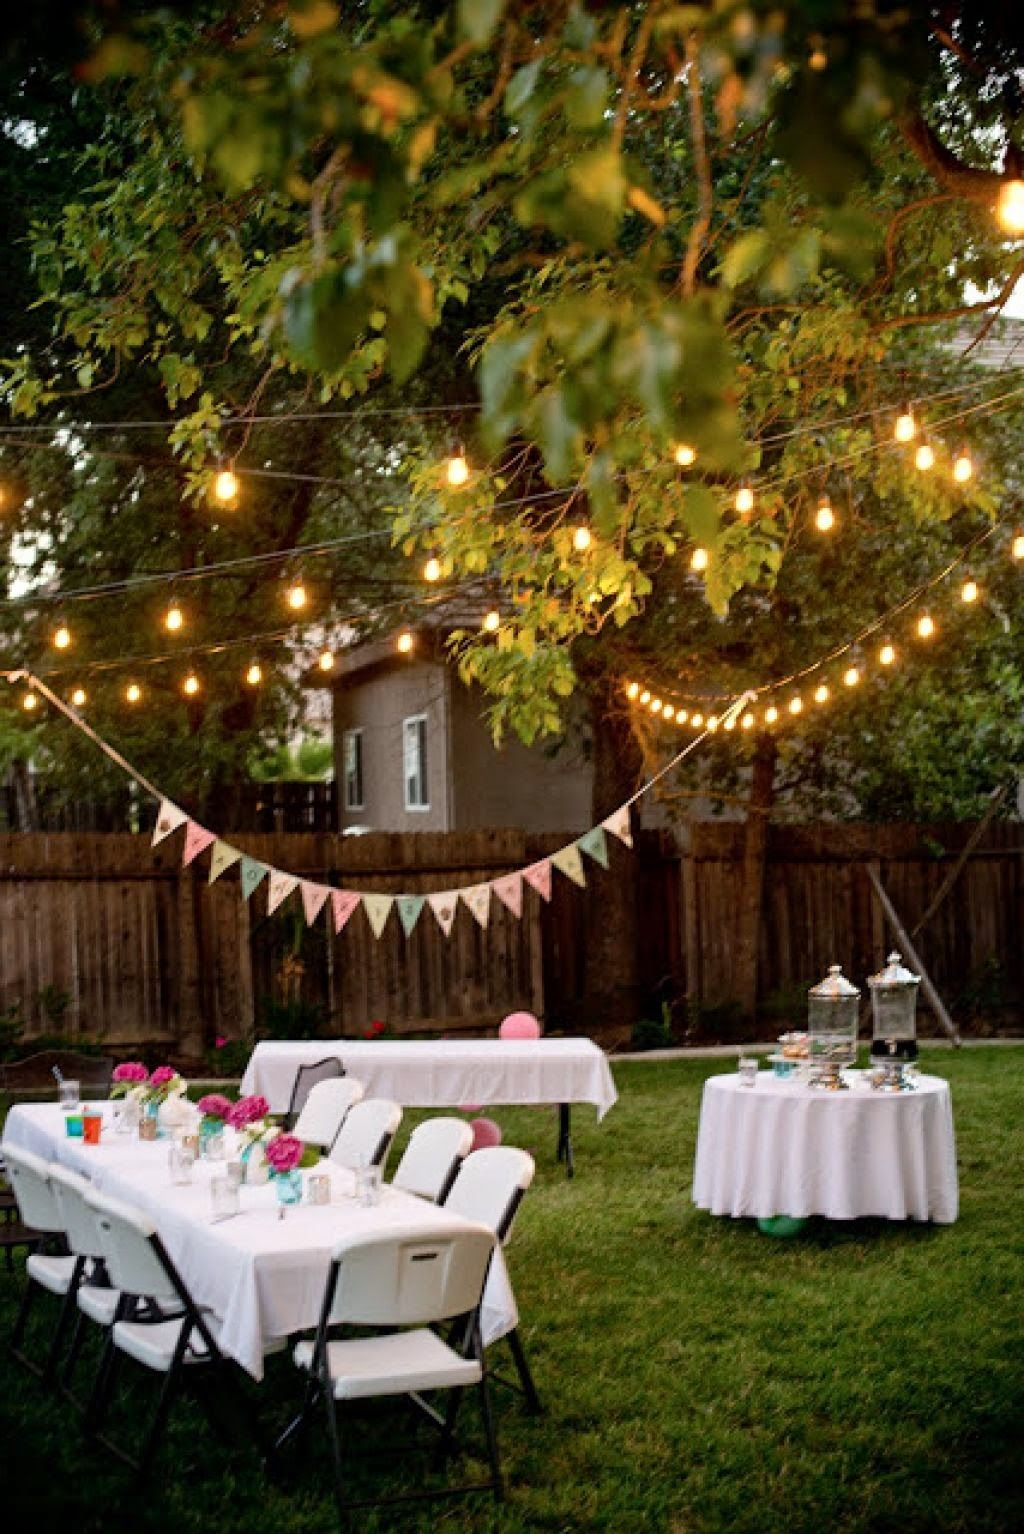 Backyard Party Decorating Diy Garden Party Backyard Party